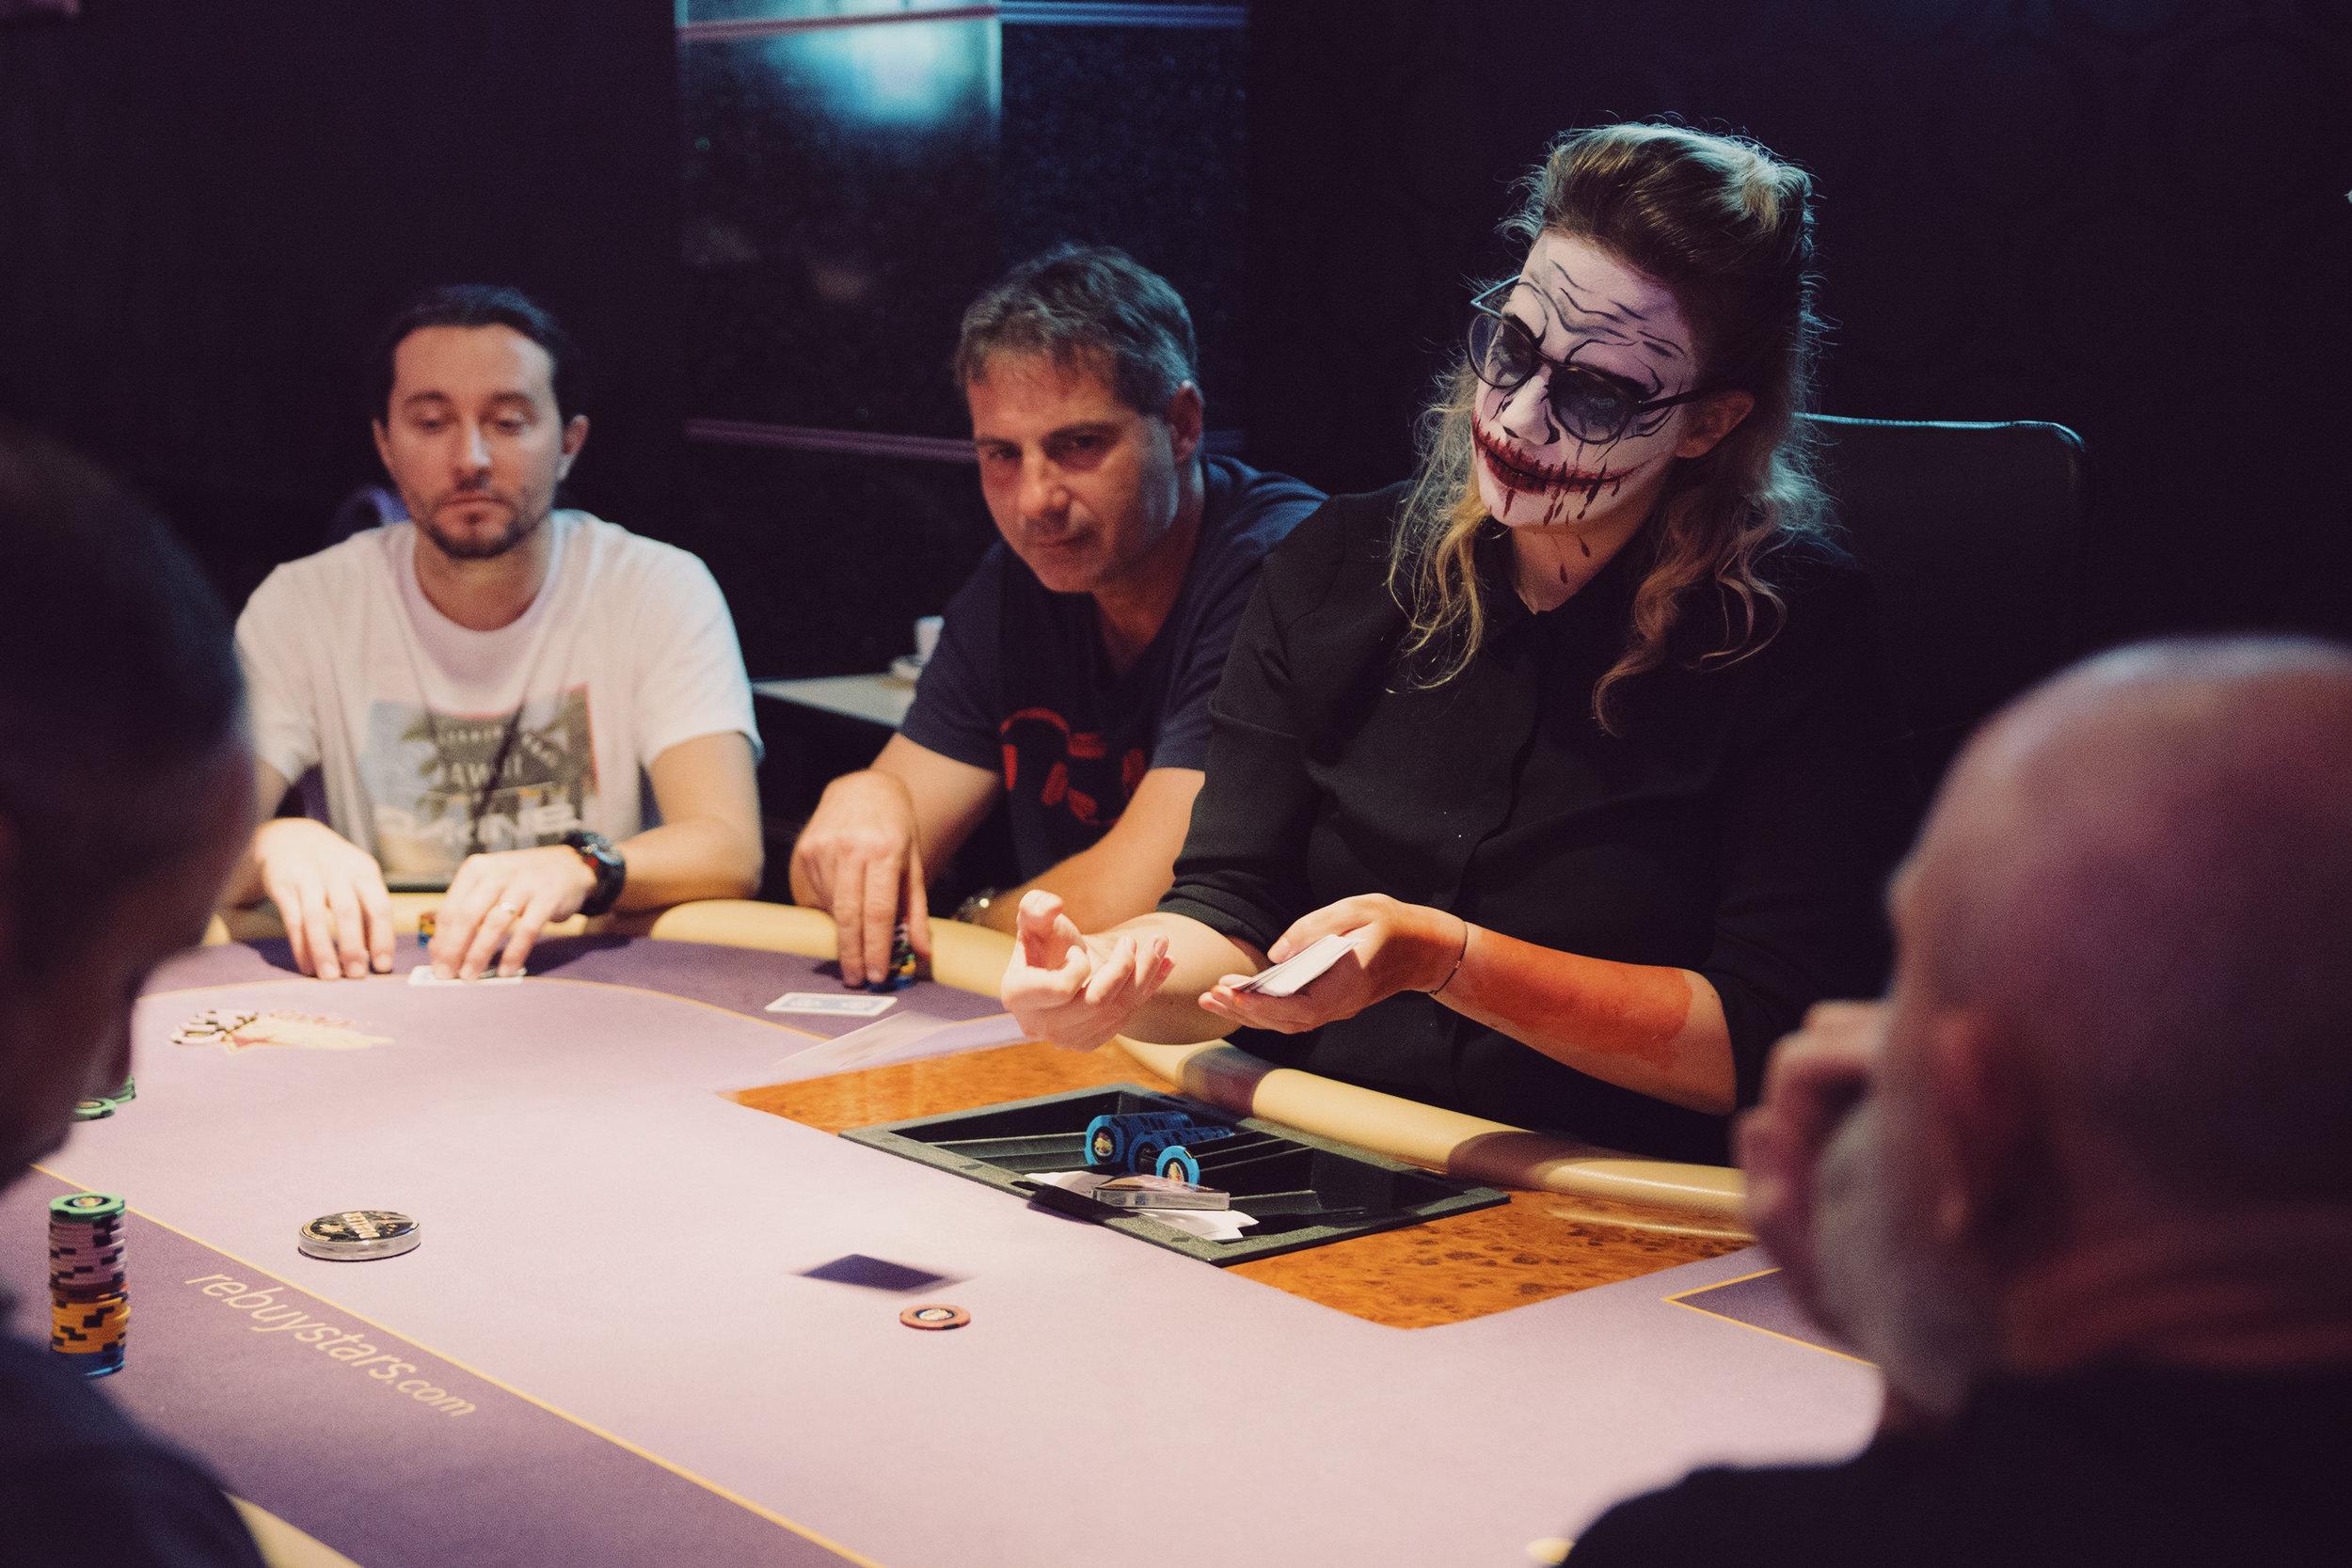 Poker-Photography-Europe-Polina-Shubkina-Casino-RebuyStars-004.JPG